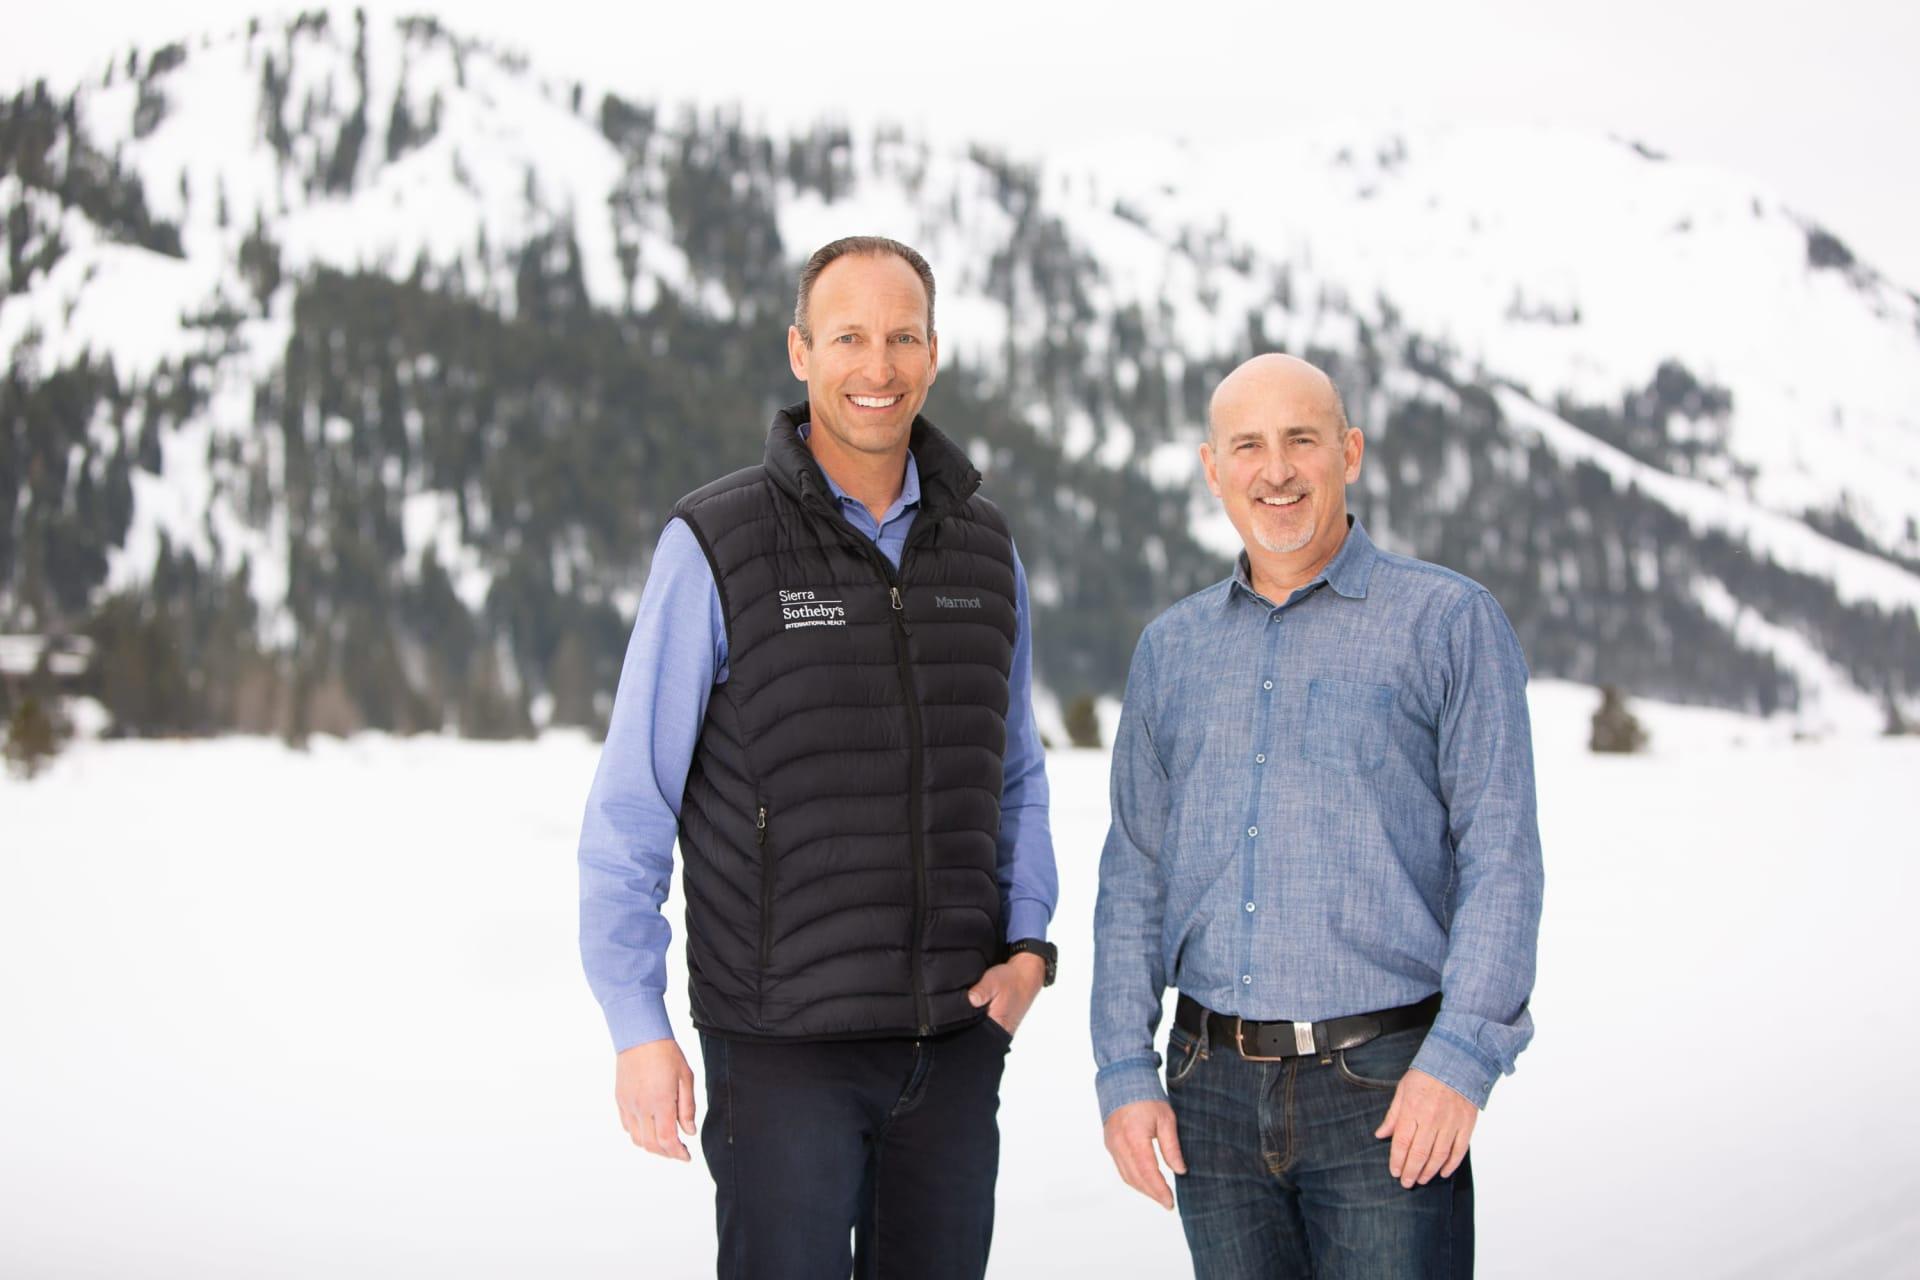 Breck Overall and Jeff Hamilton